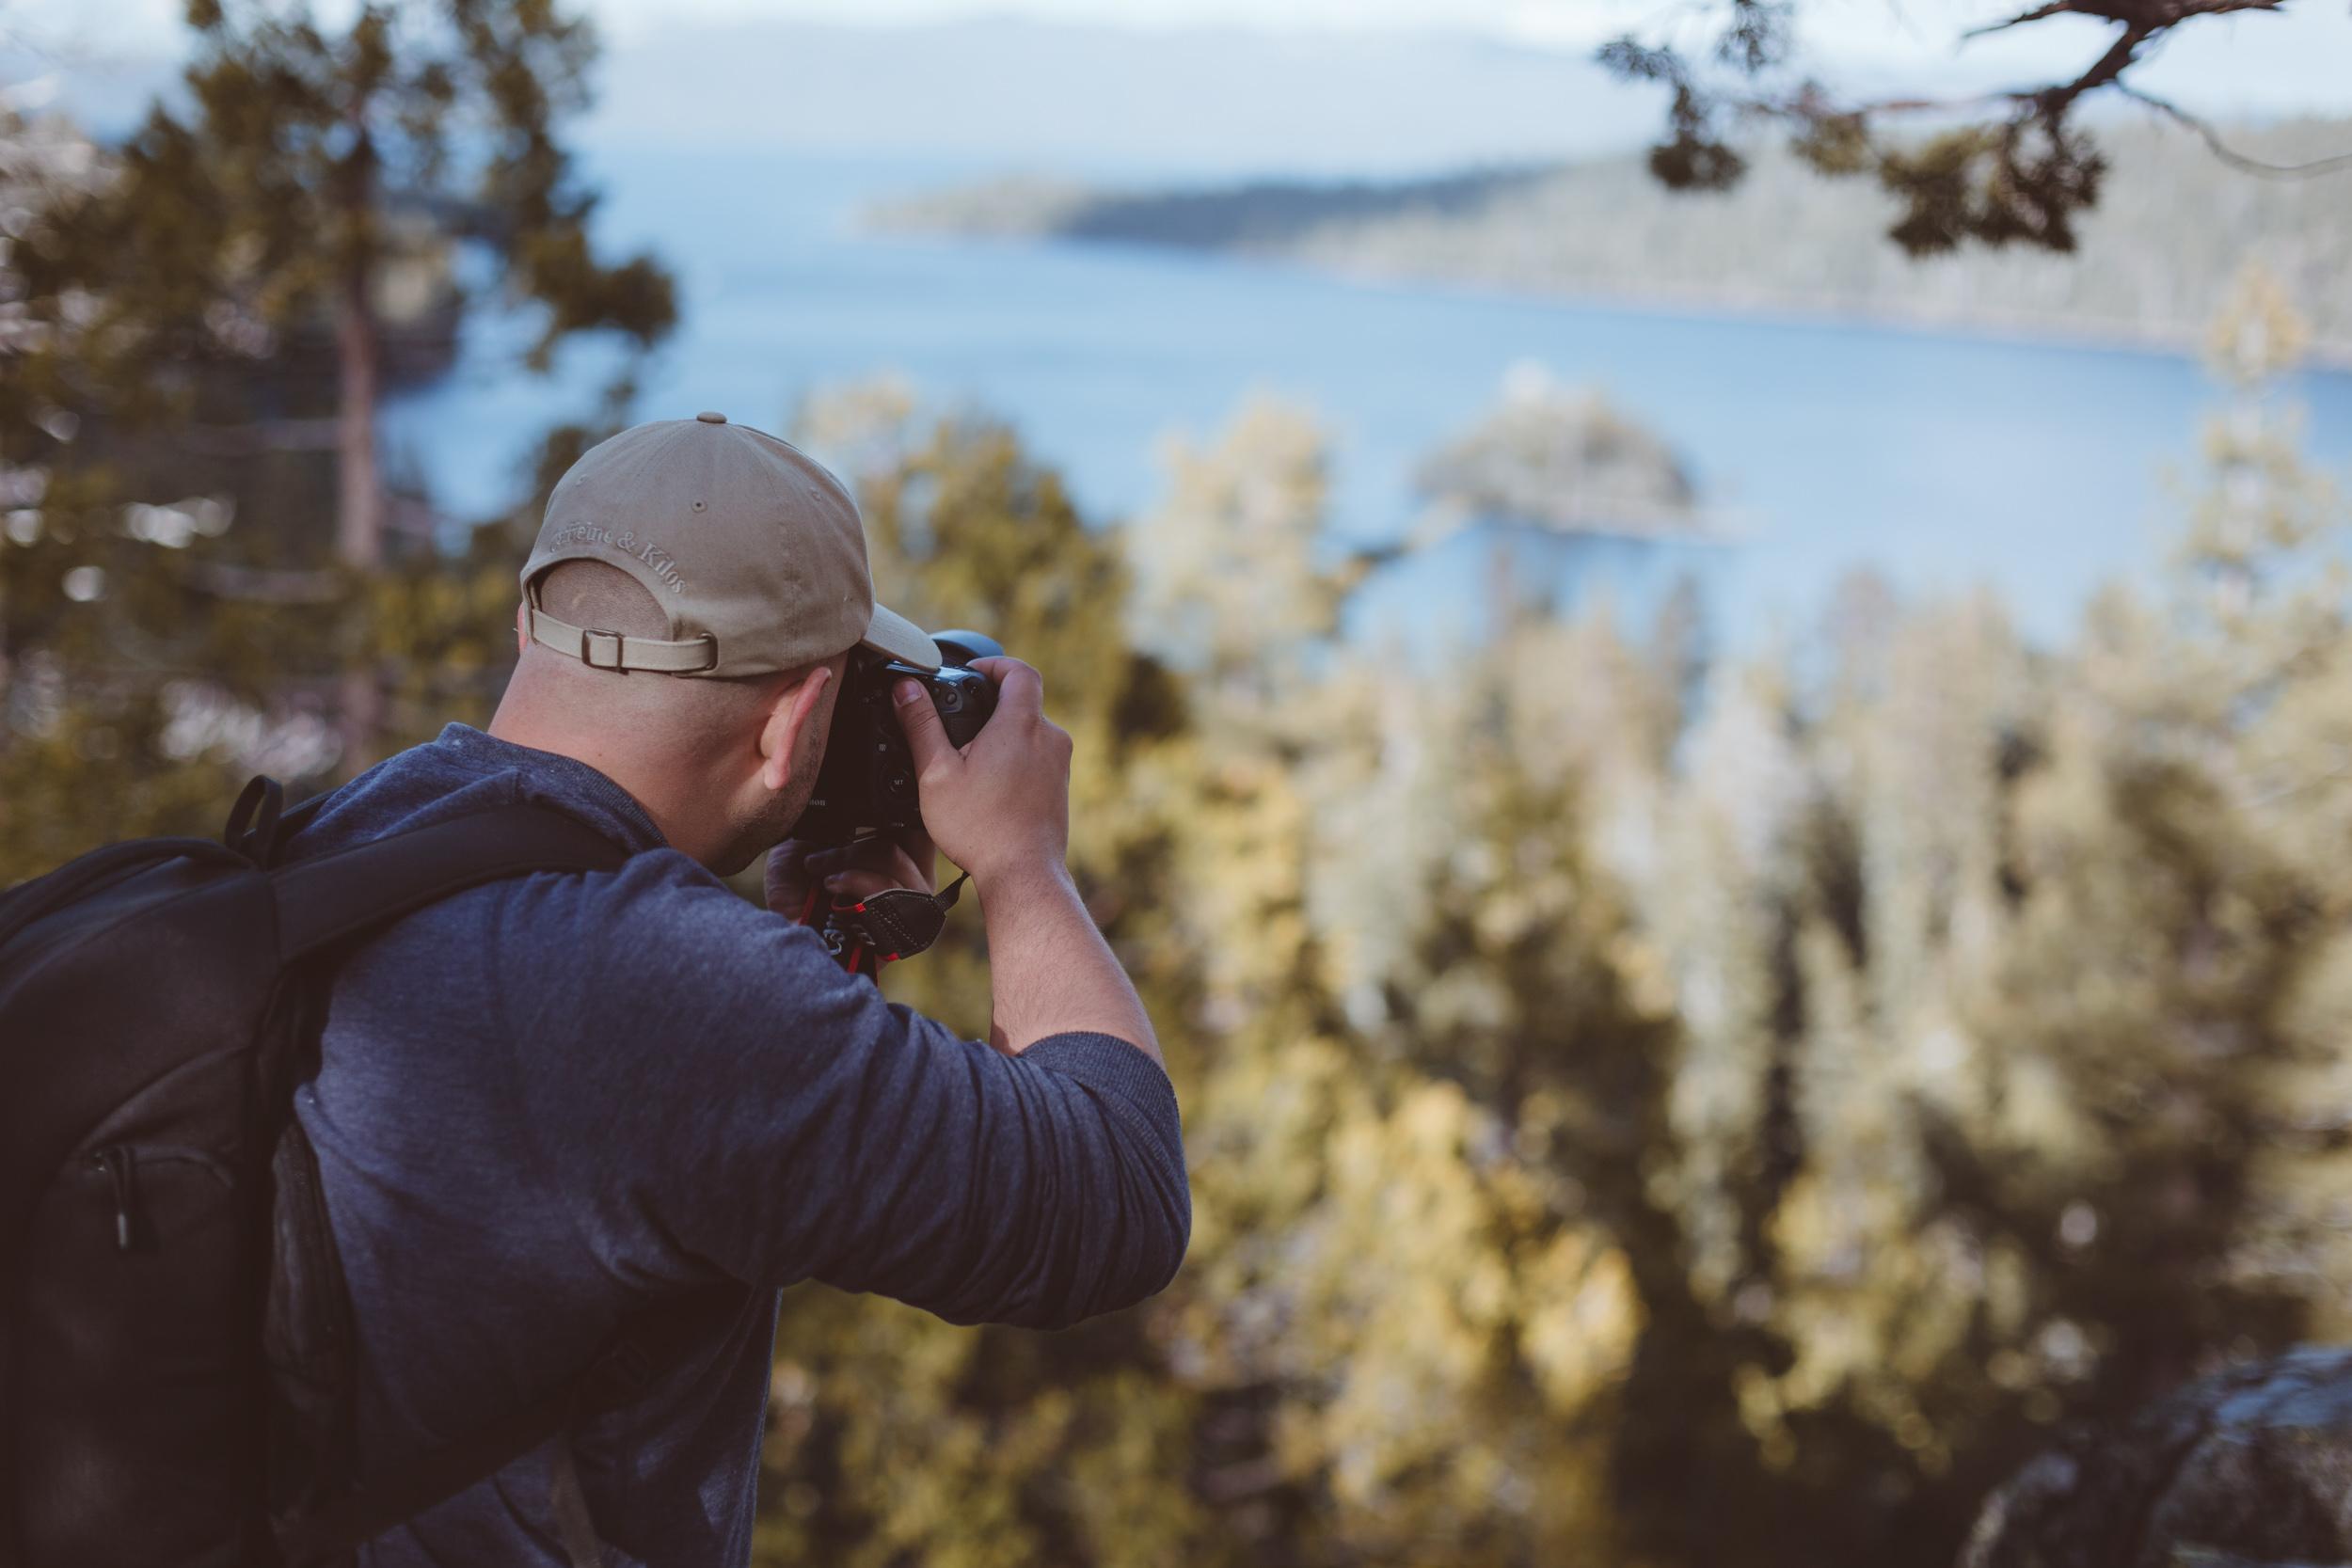 west-shore-adventure-eagle-falls-fannette-hike-and-shoot-1.jpg